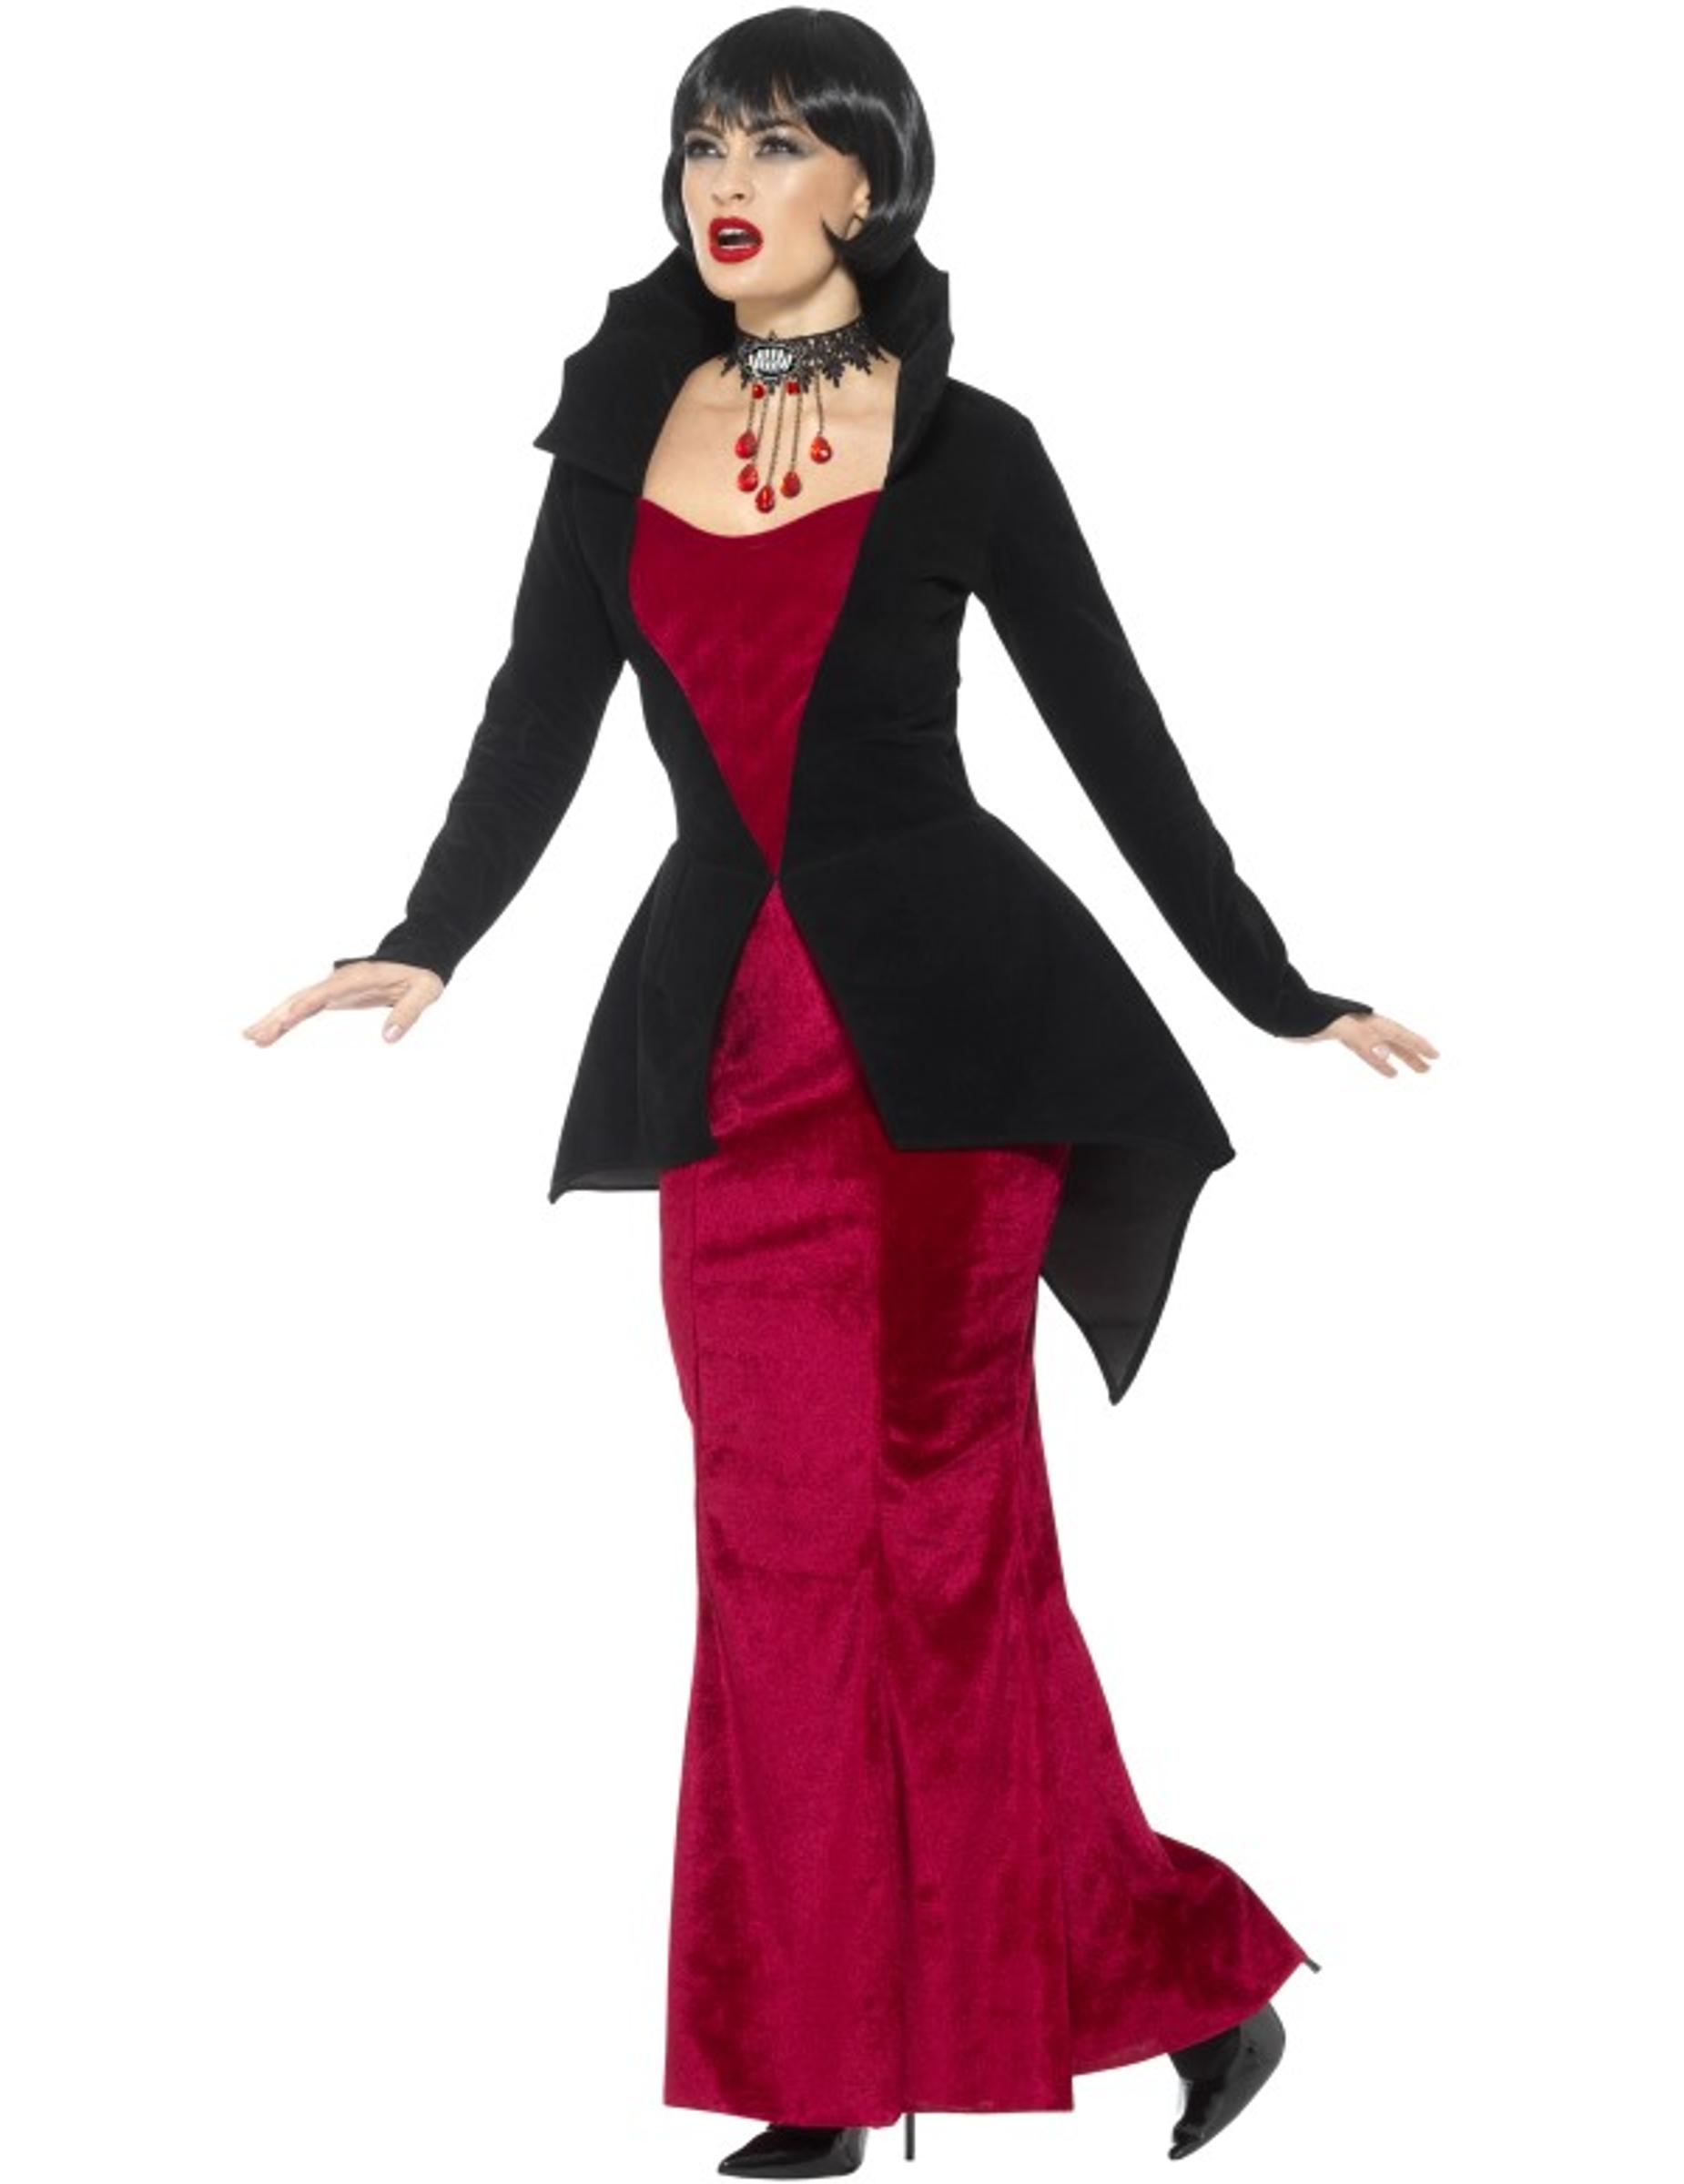 k nigliches vampir kost m f r damen kost me f r. Black Bedroom Furniture Sets. Home Design Ideas